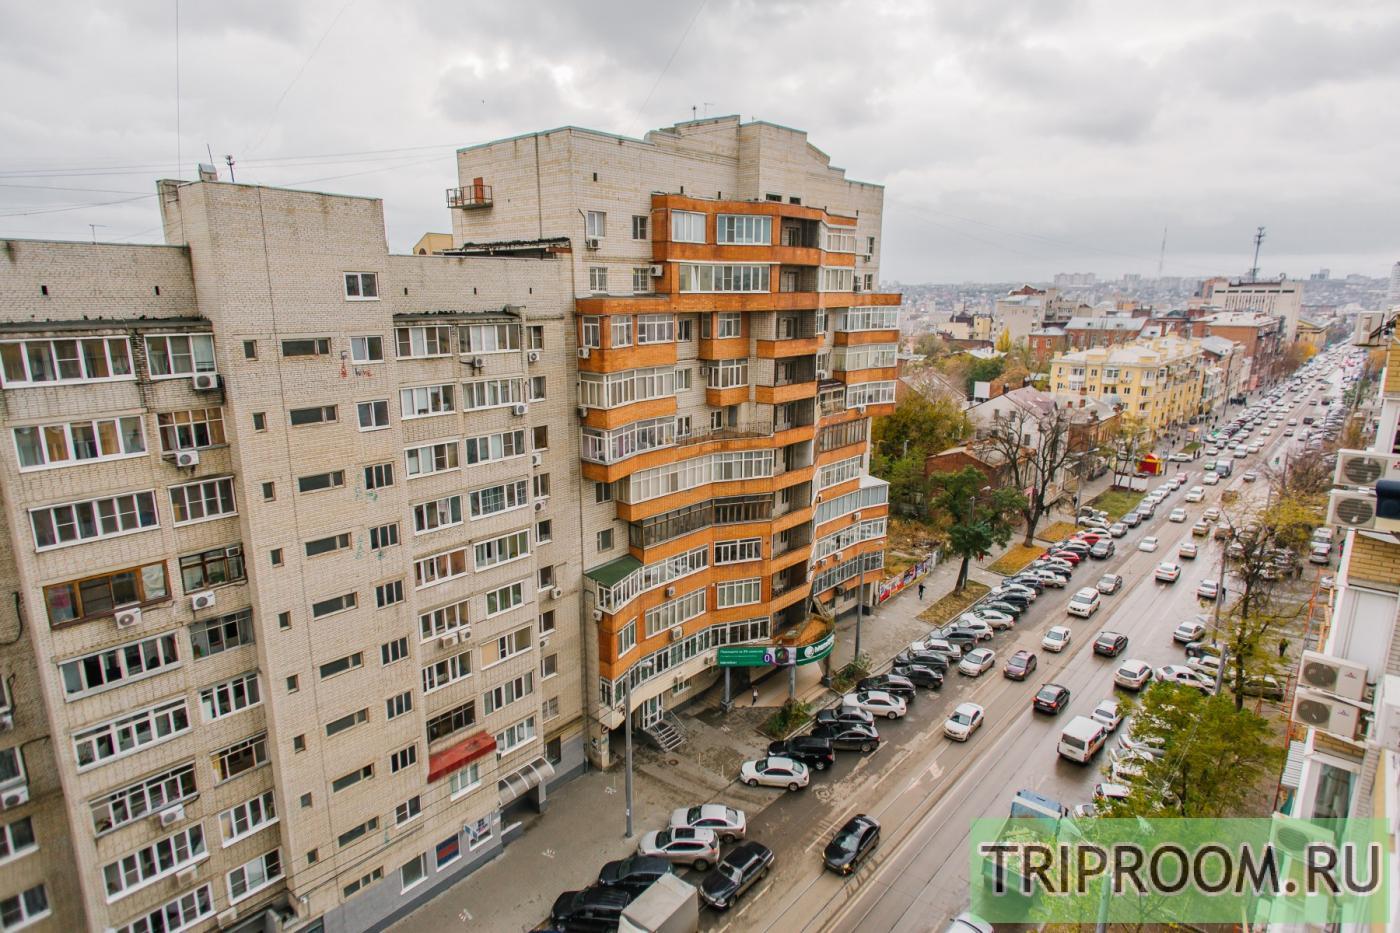 2-комнатная квартира посуточно (вариант № 23730), ул. Максима Горького улица, фото № 26